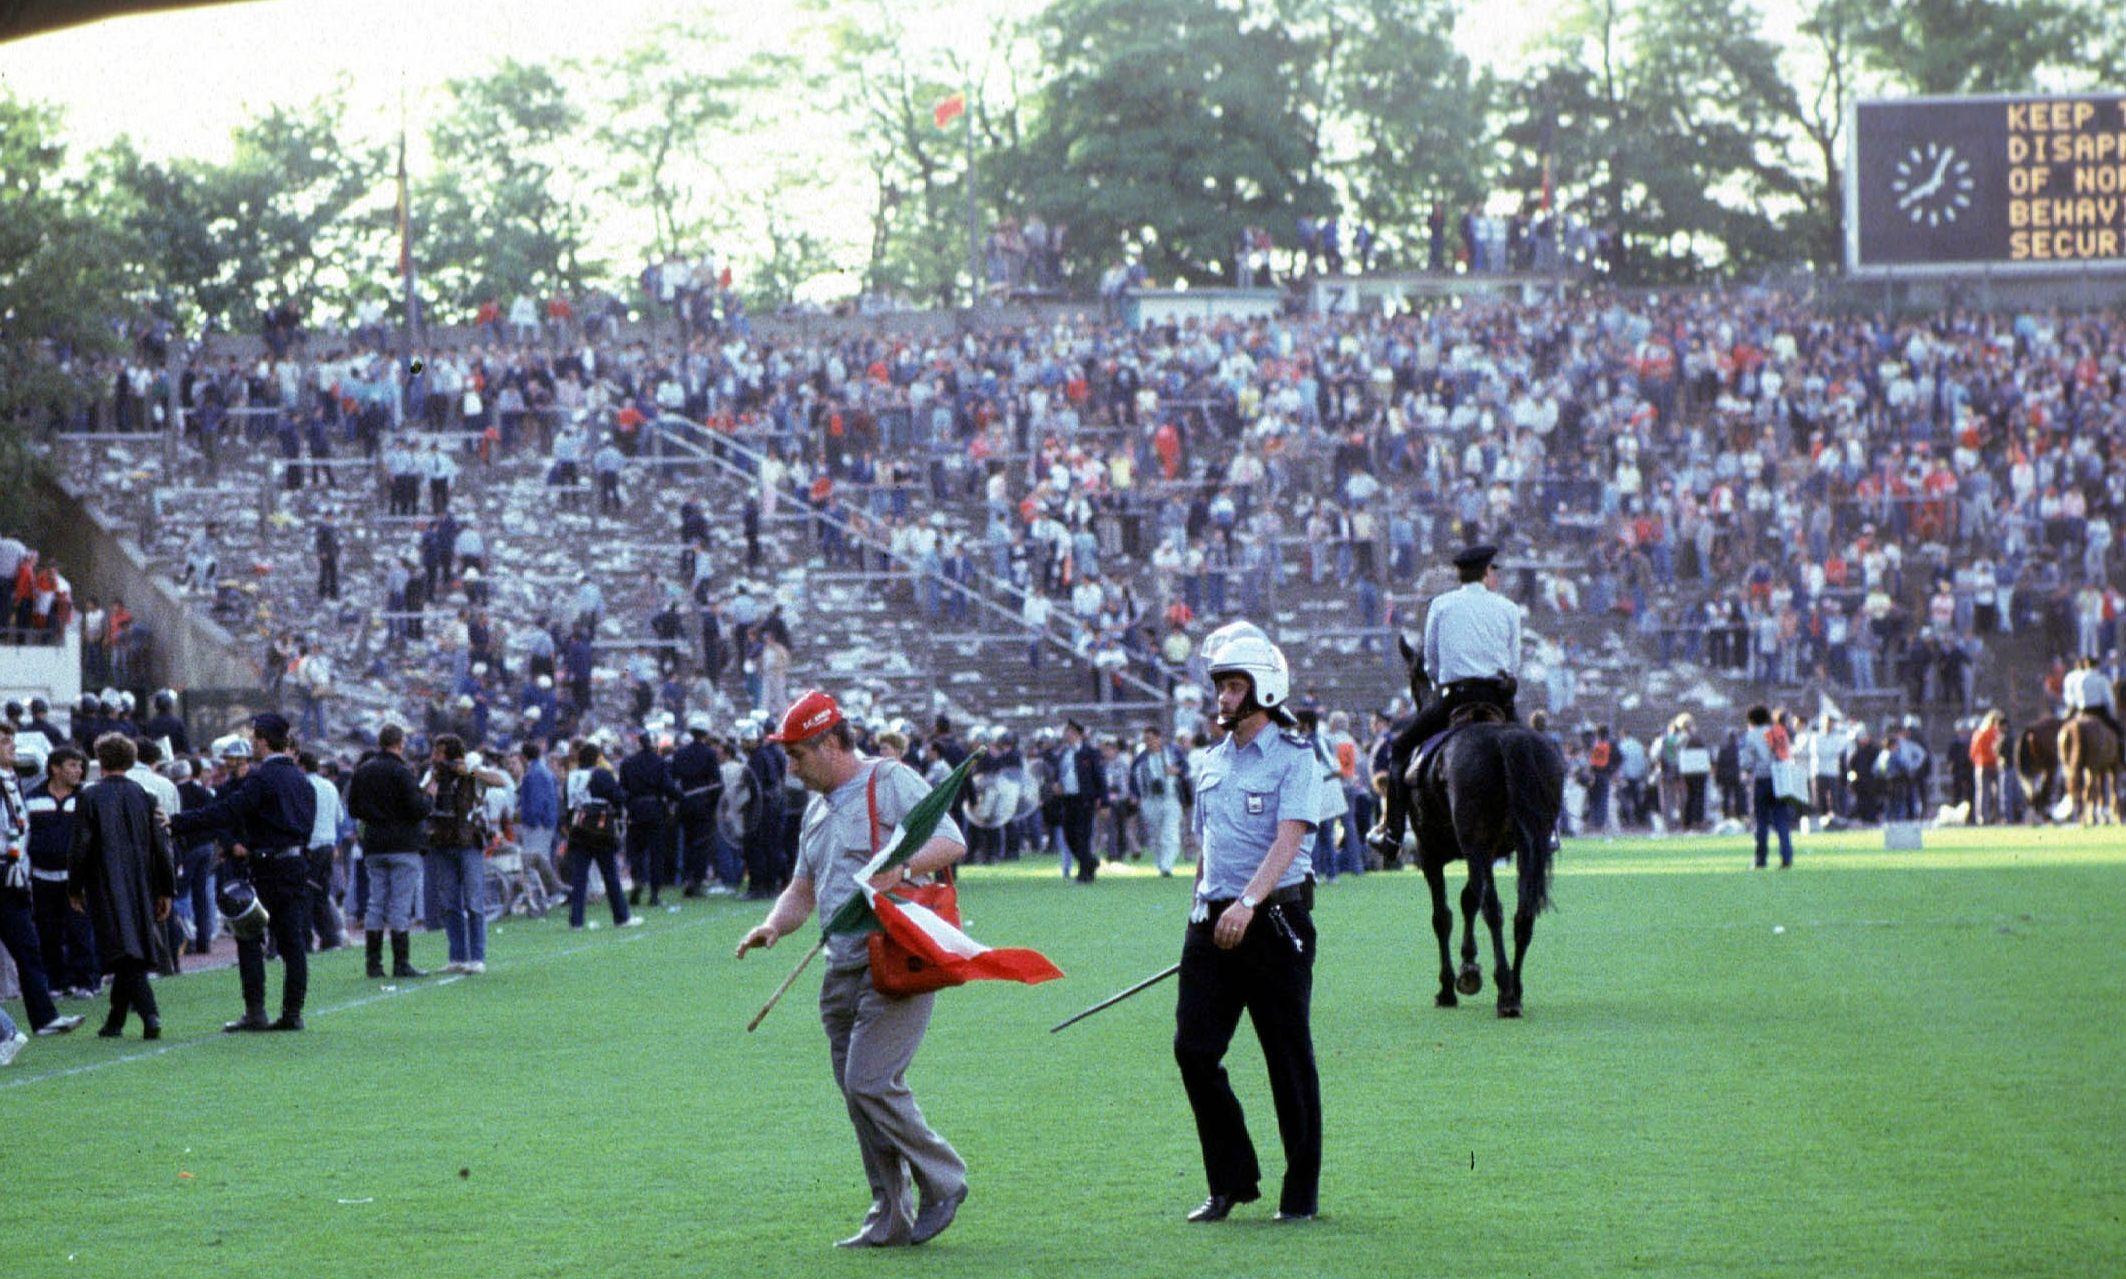 Football - Ligue des champions - 29 mai 1985: le football compte ses morts au stade du Heysel